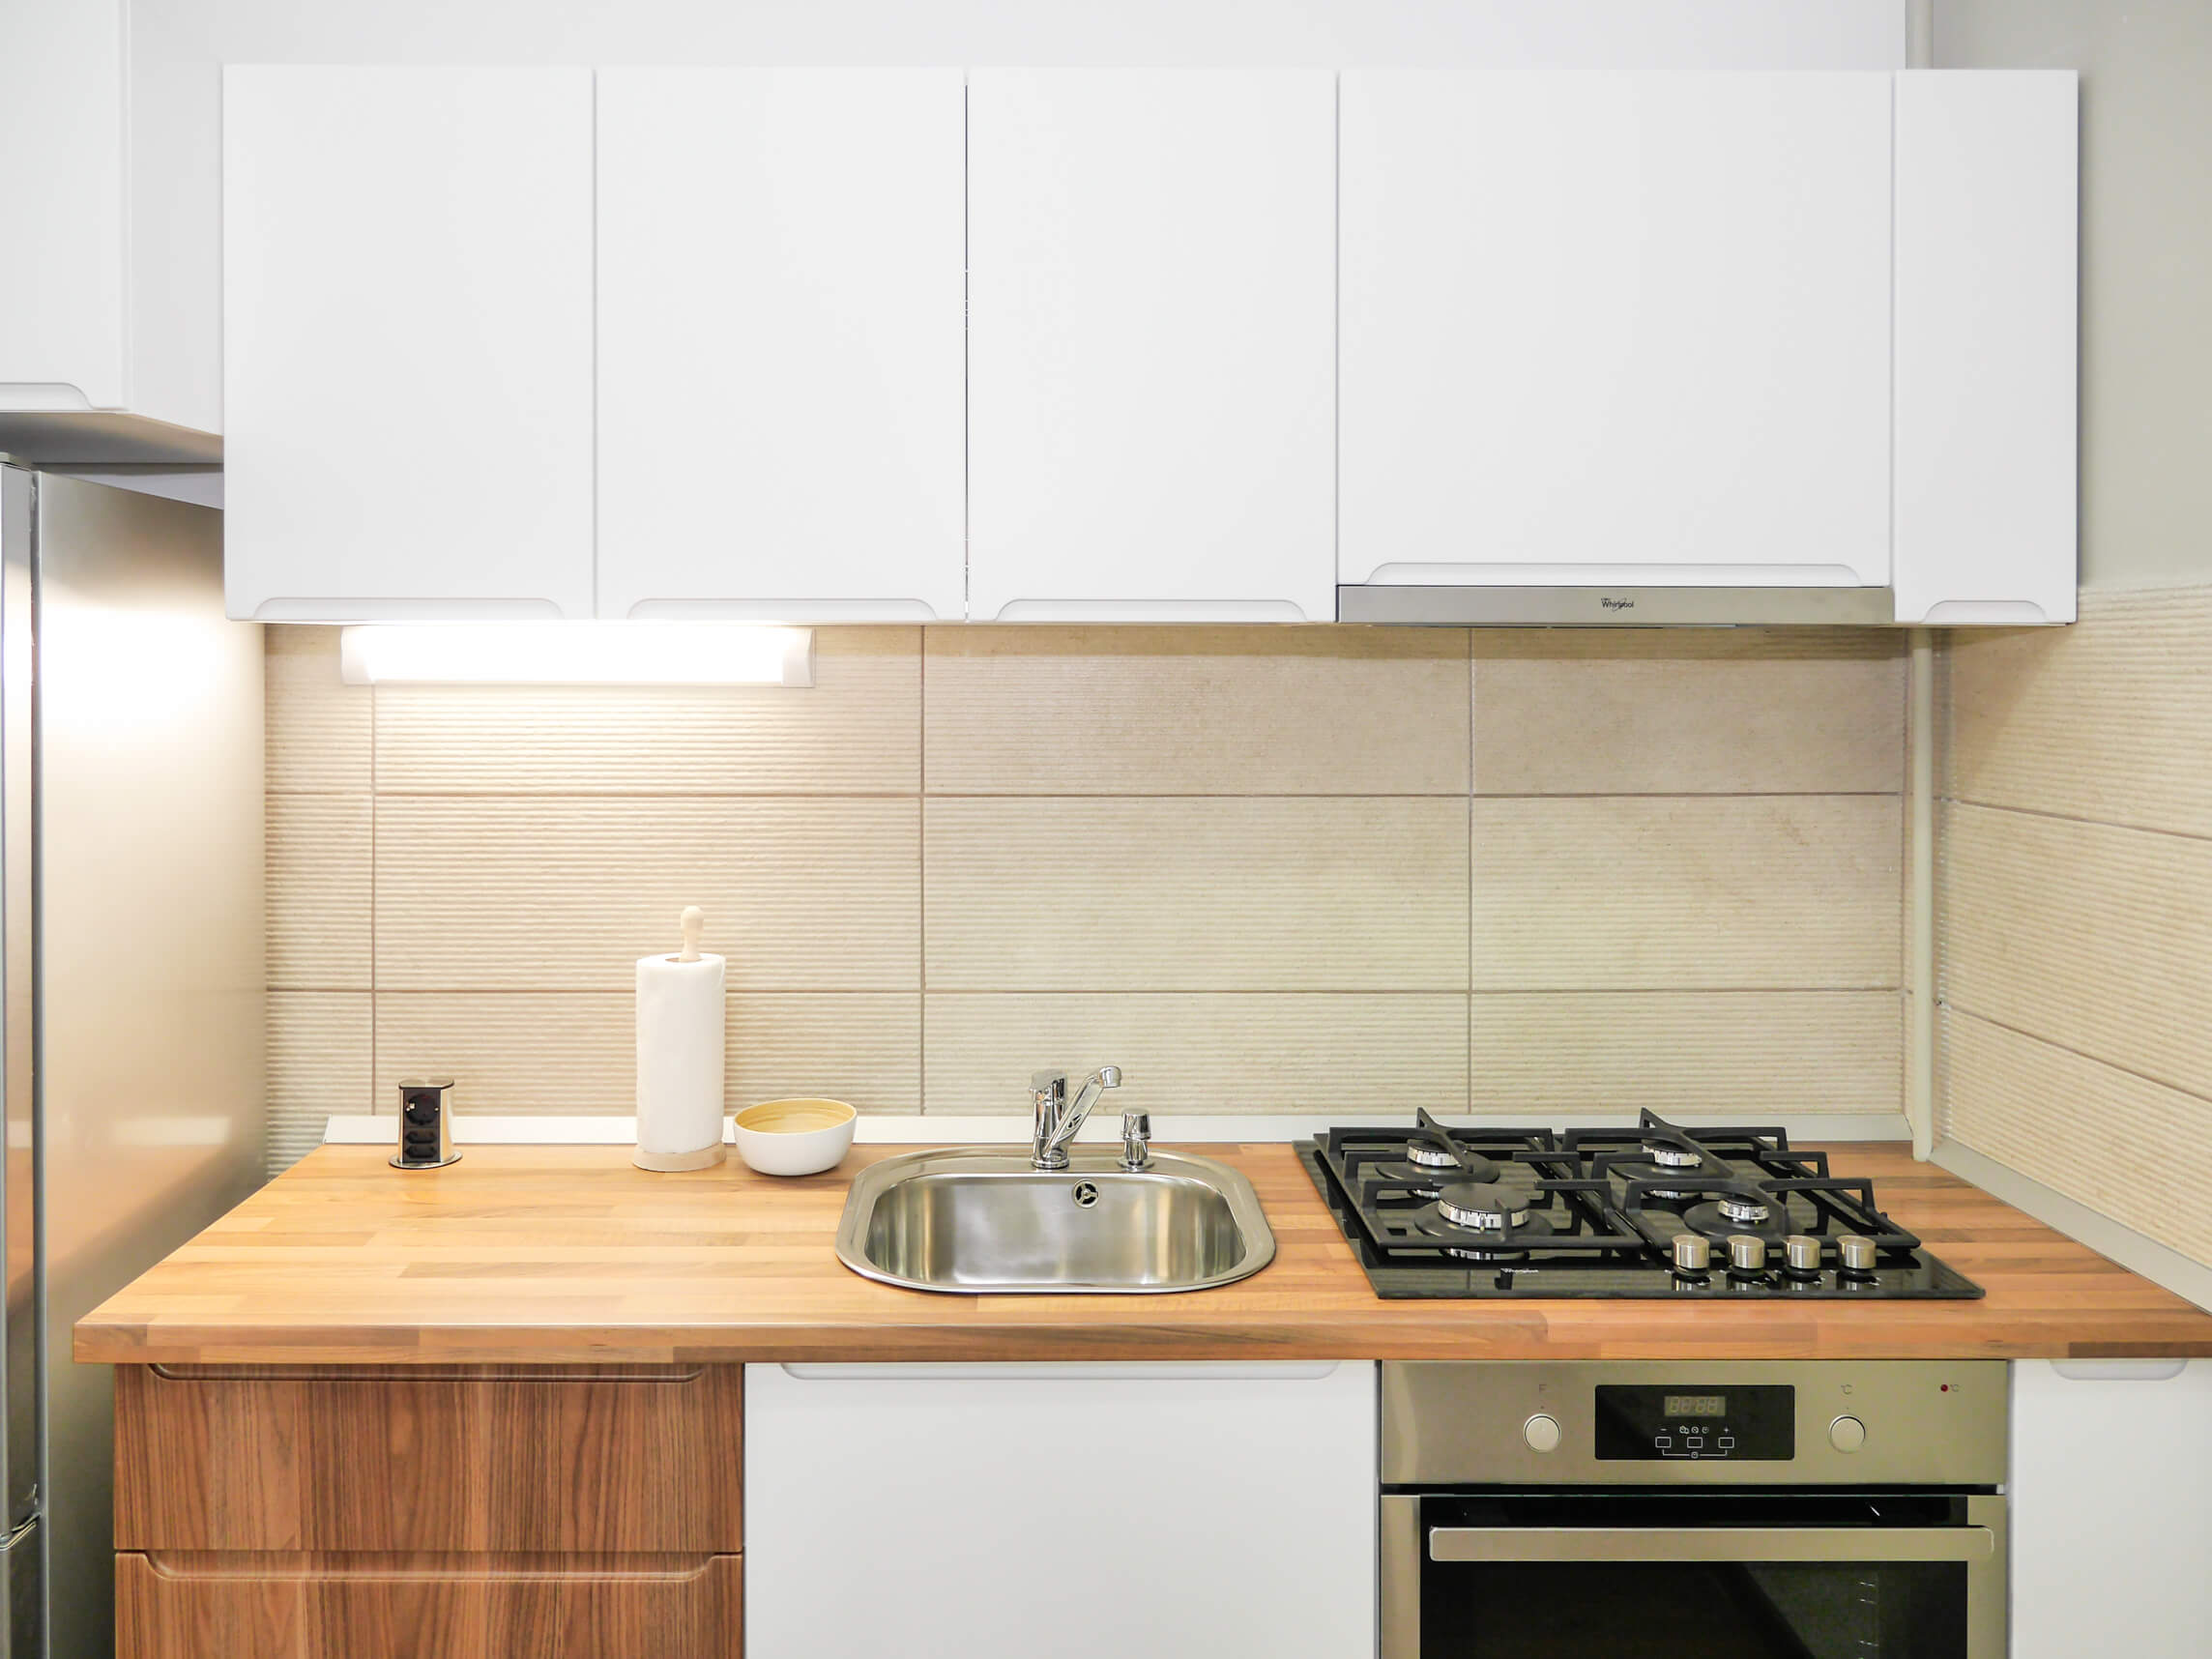 Clement Apartments - apartamente de inchiriat in regim hotelier - cazare neamt - cazare piatra neamt (3)